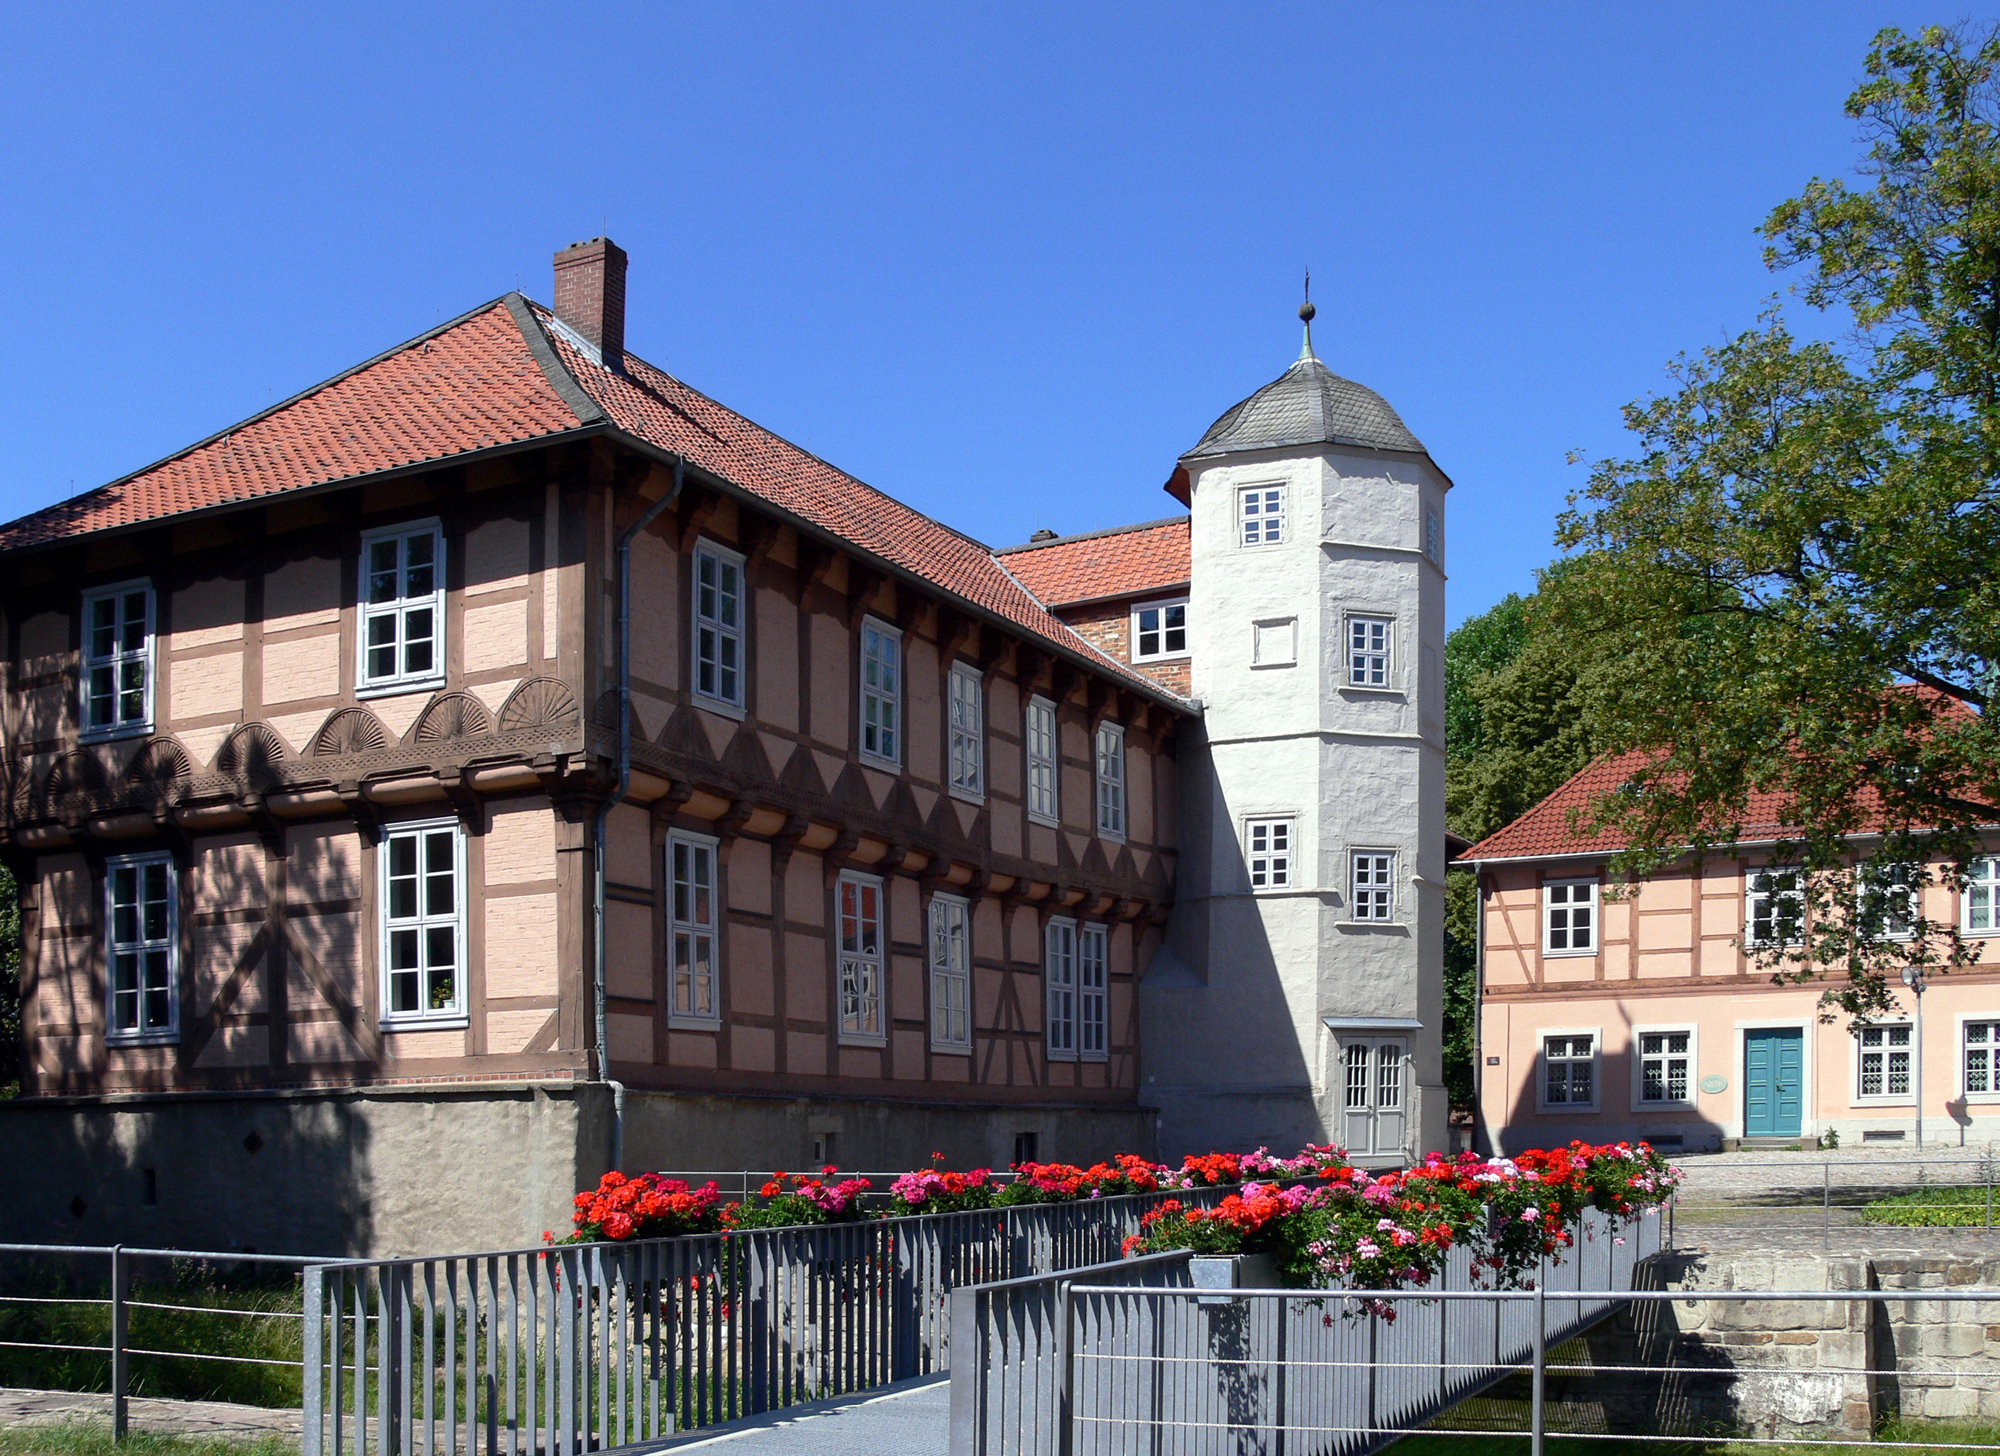 The front of the Hoffmann von Fallersleben Museum